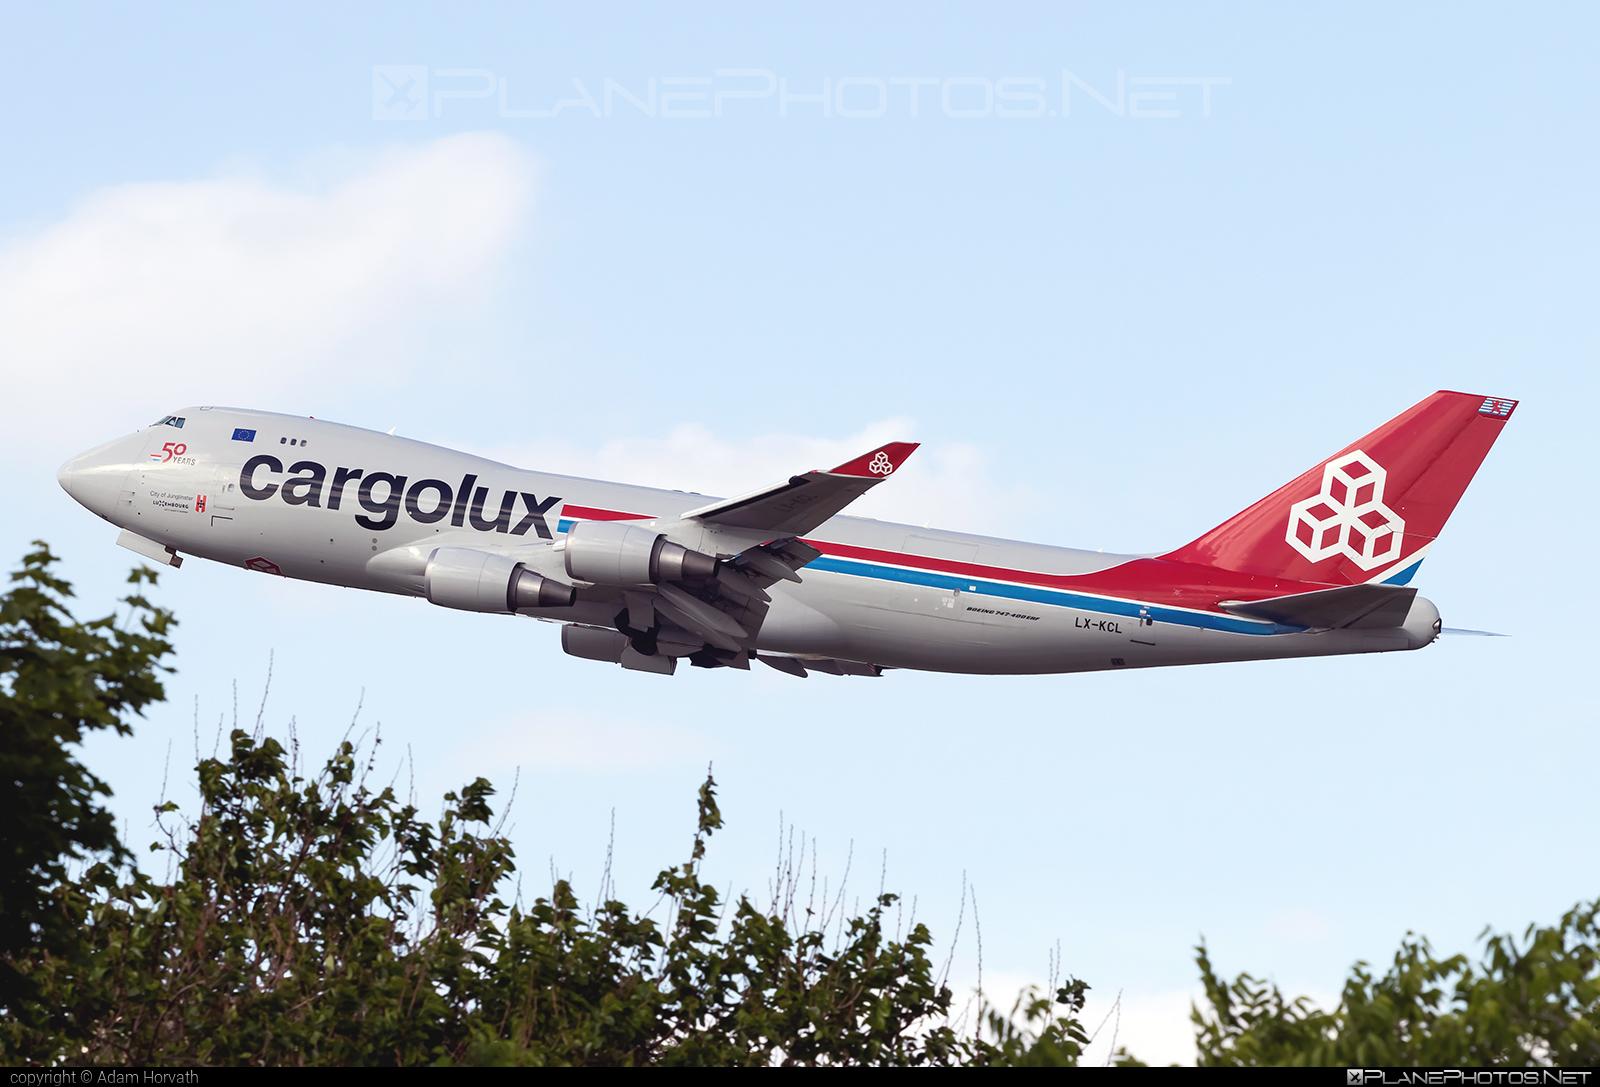 Boeing 747-400ERF - LX-KCL operated by Cargolux Airlines International #b747 #b747erf #b747freighter #boeing #boeing747 #cargolux #jumbo